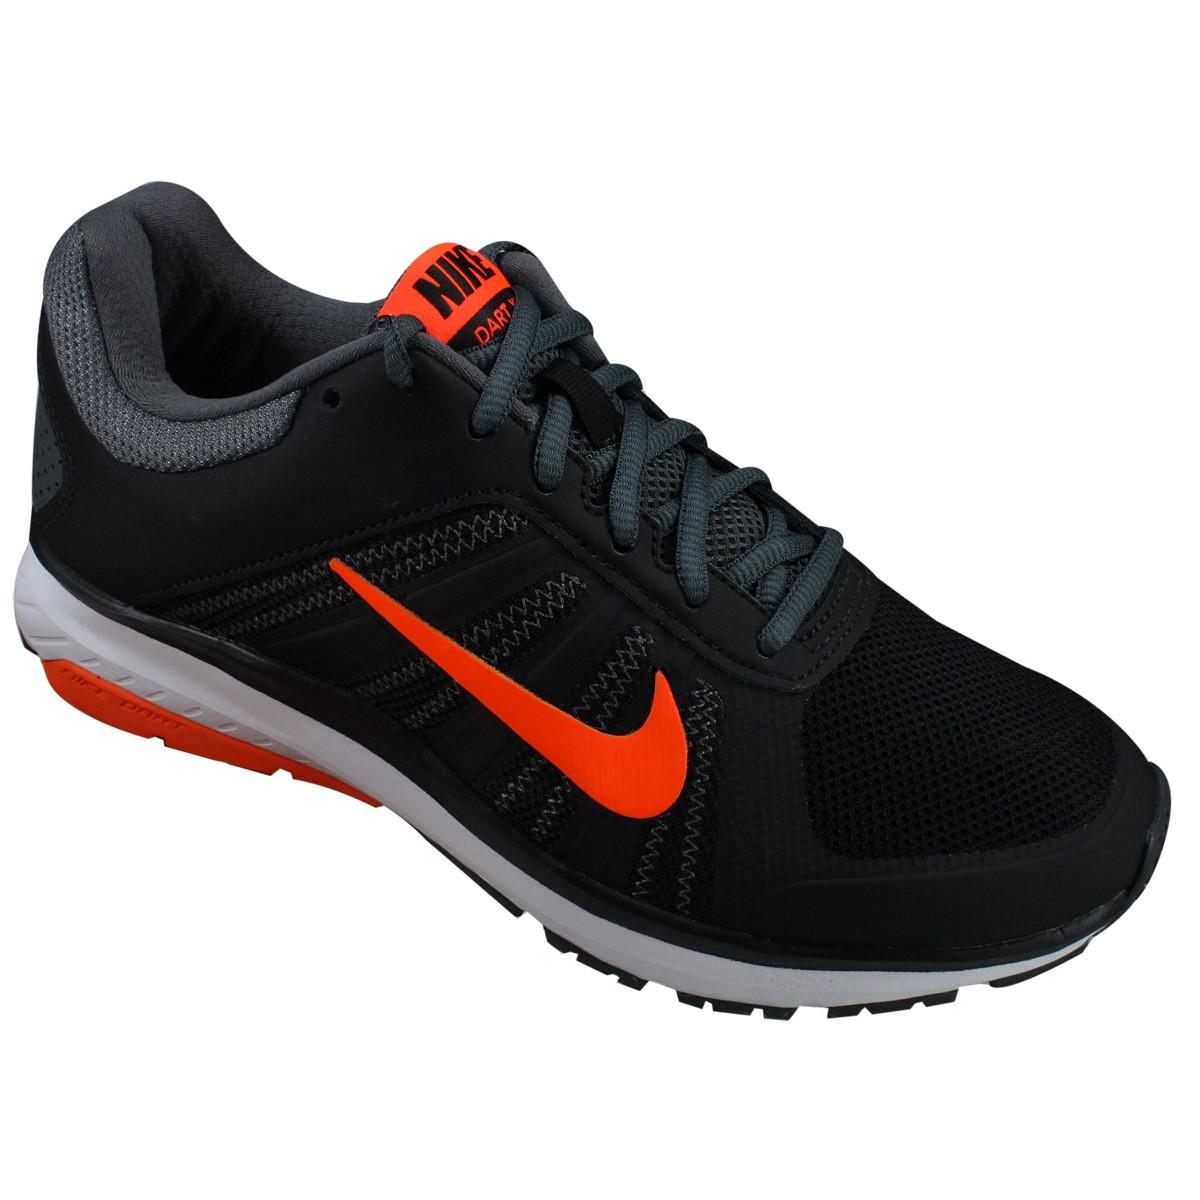 a4402f7d235 Tênis Nike Dart 12 MSL 831533-009 - Preto Laranja - Botas Online ...